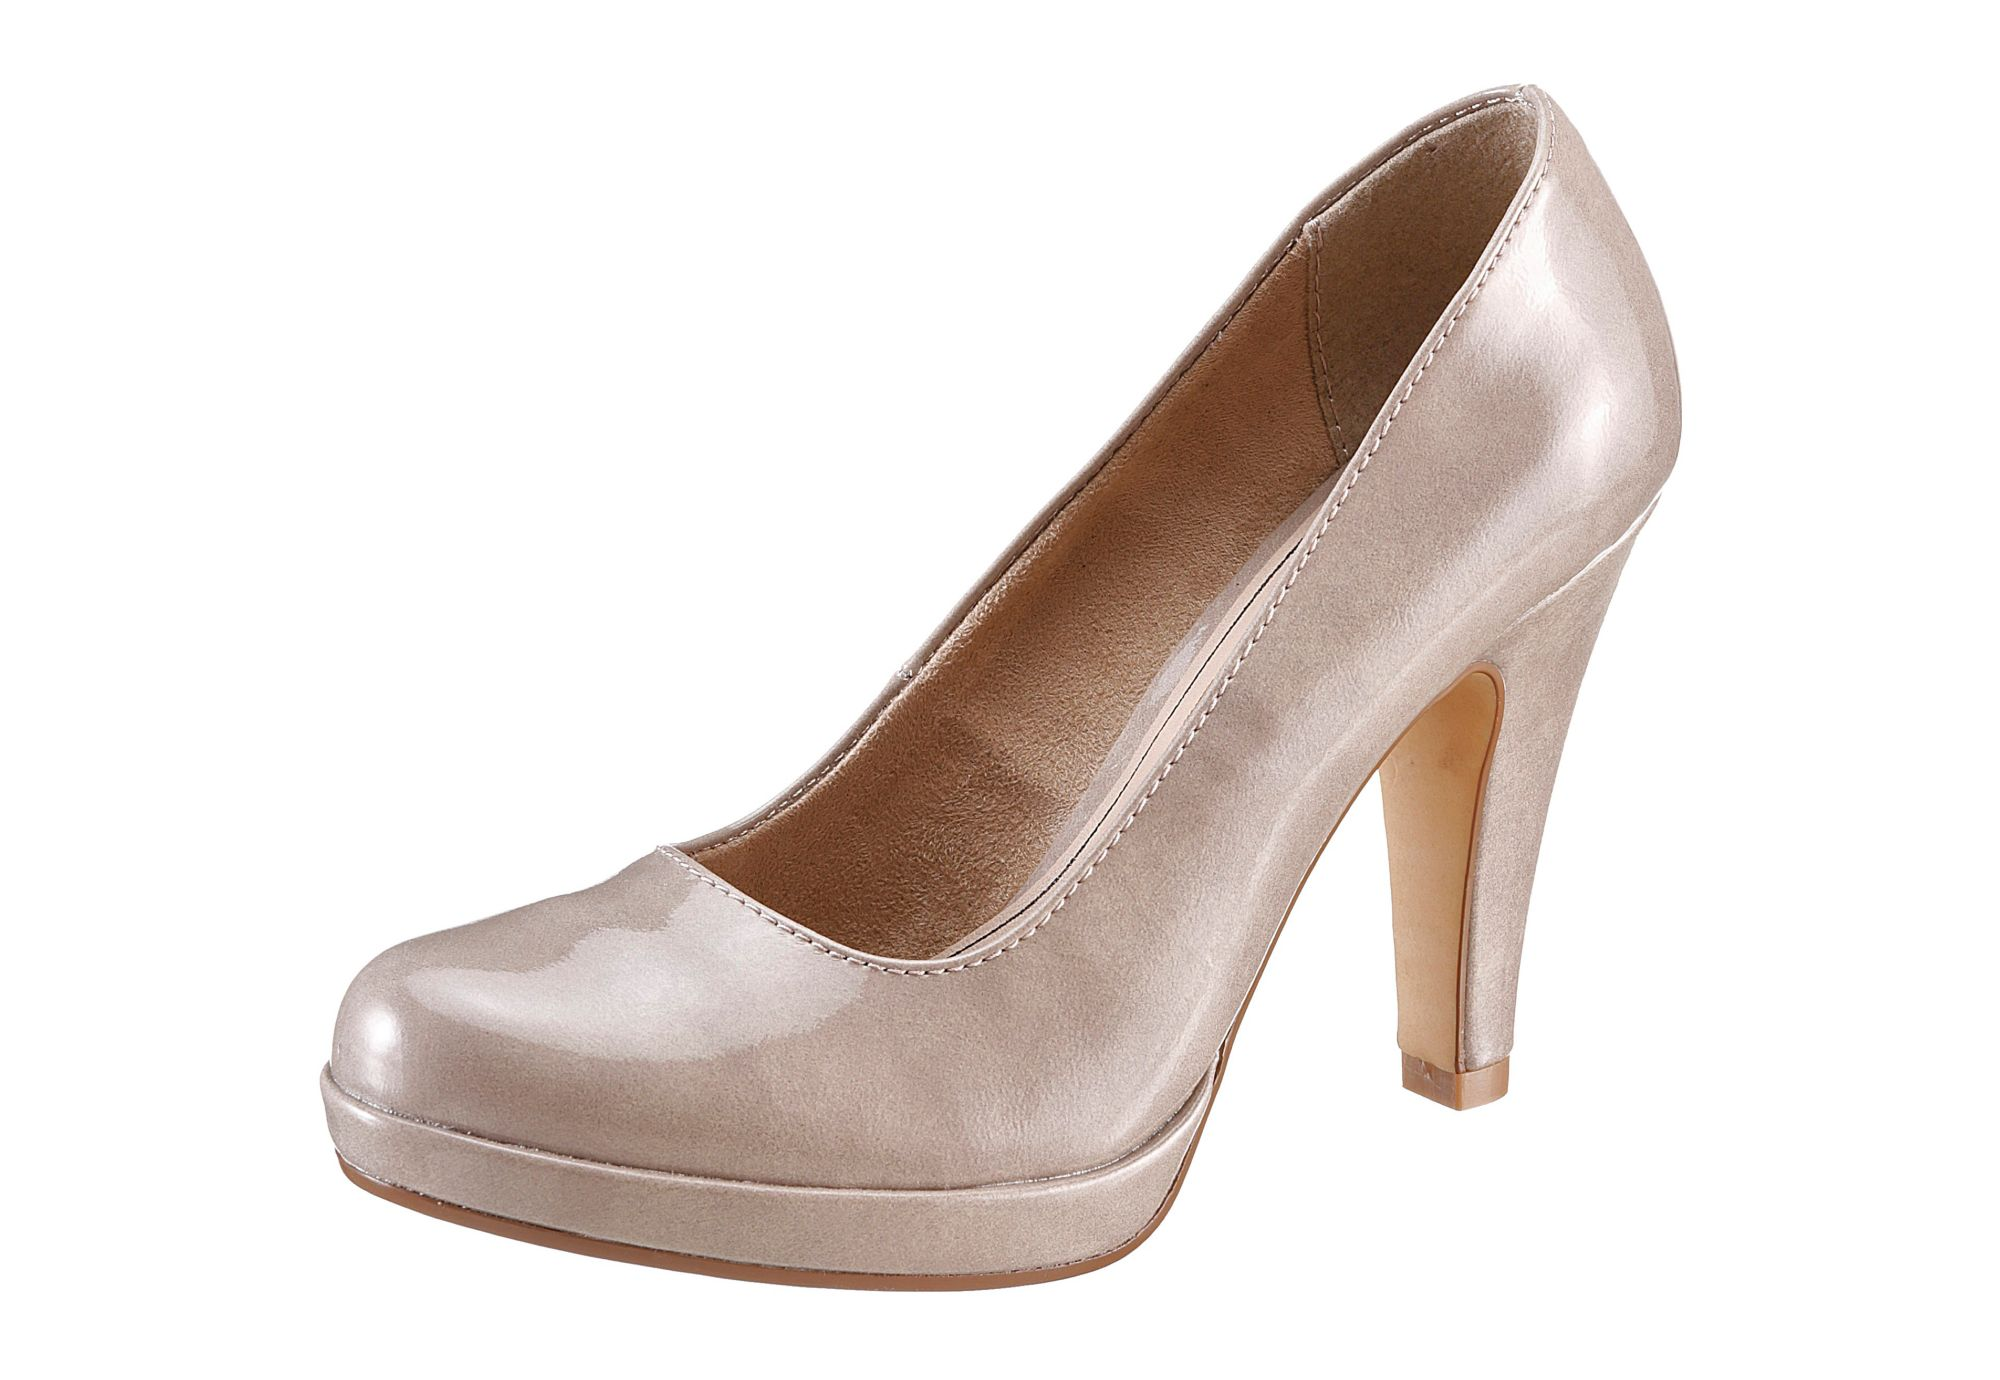 tamaris high heel pumps schwab versand glitter glamour. Black Bedroom Furniture Sets. Home Design Ideas